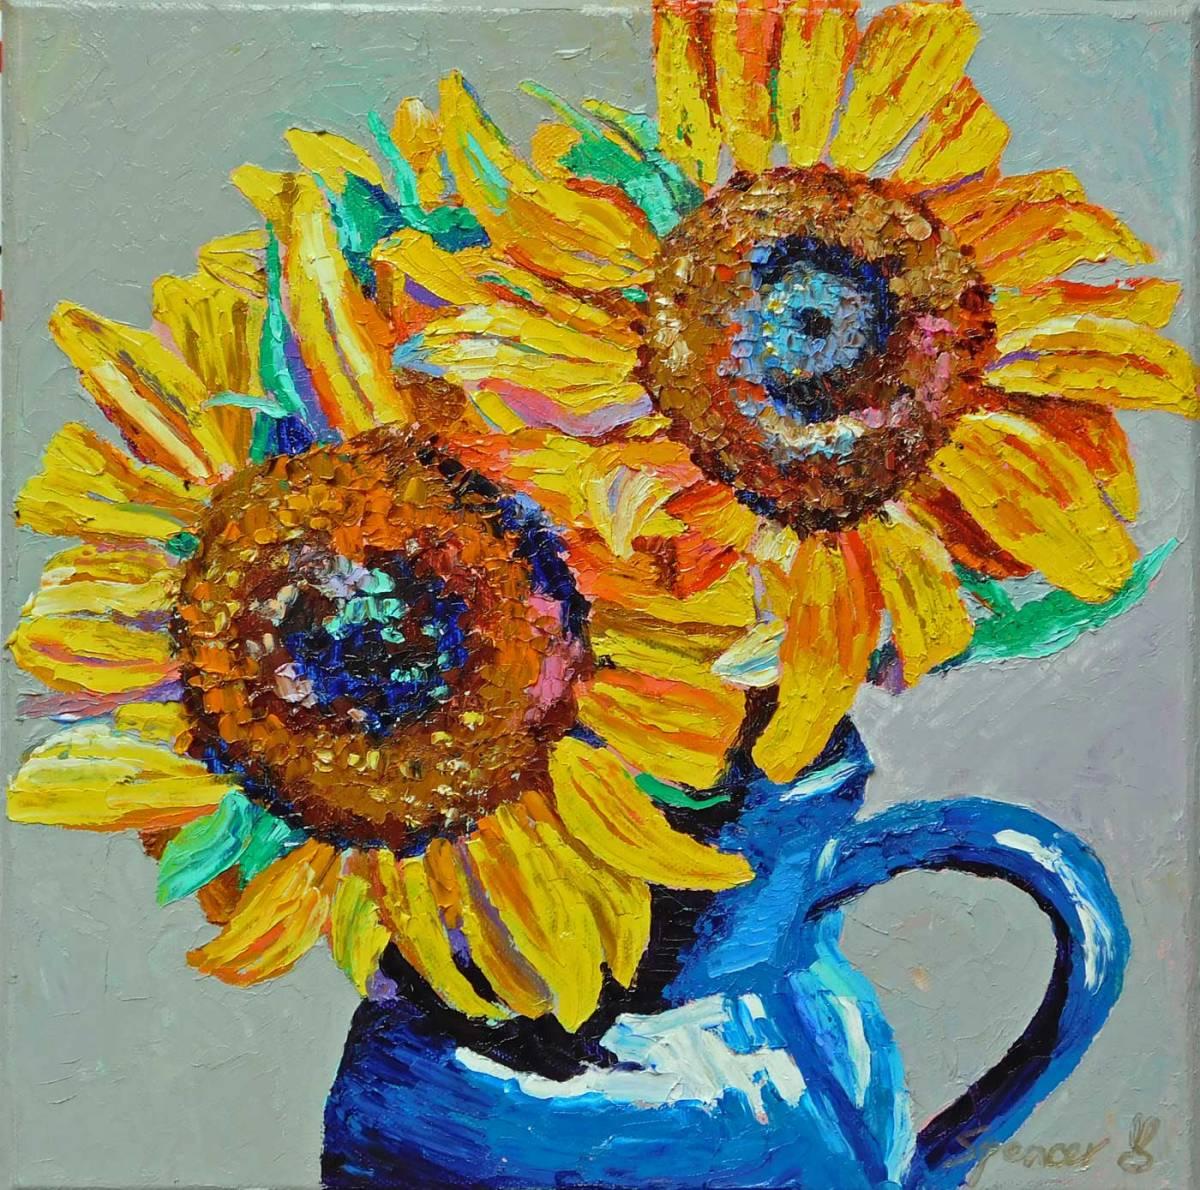 sunflowers12x12